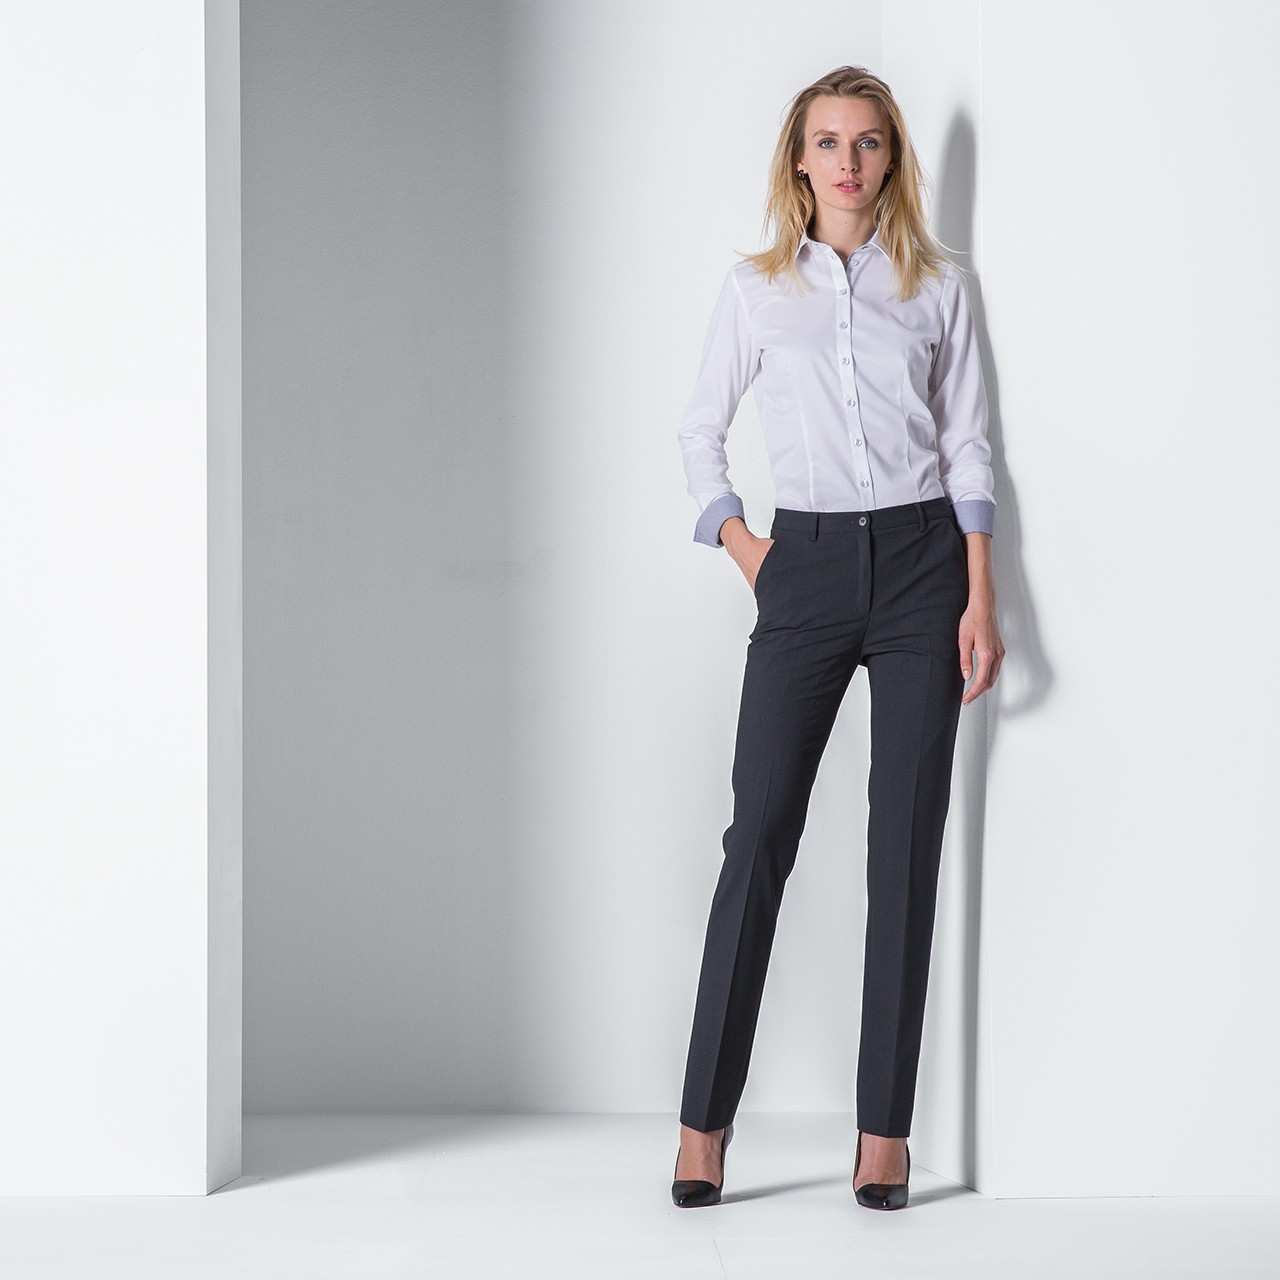 Damen Hose Regular Fit Greiff®   bedrucken, besticken, bedrucken lassen, besticken lassen, mit Logo  